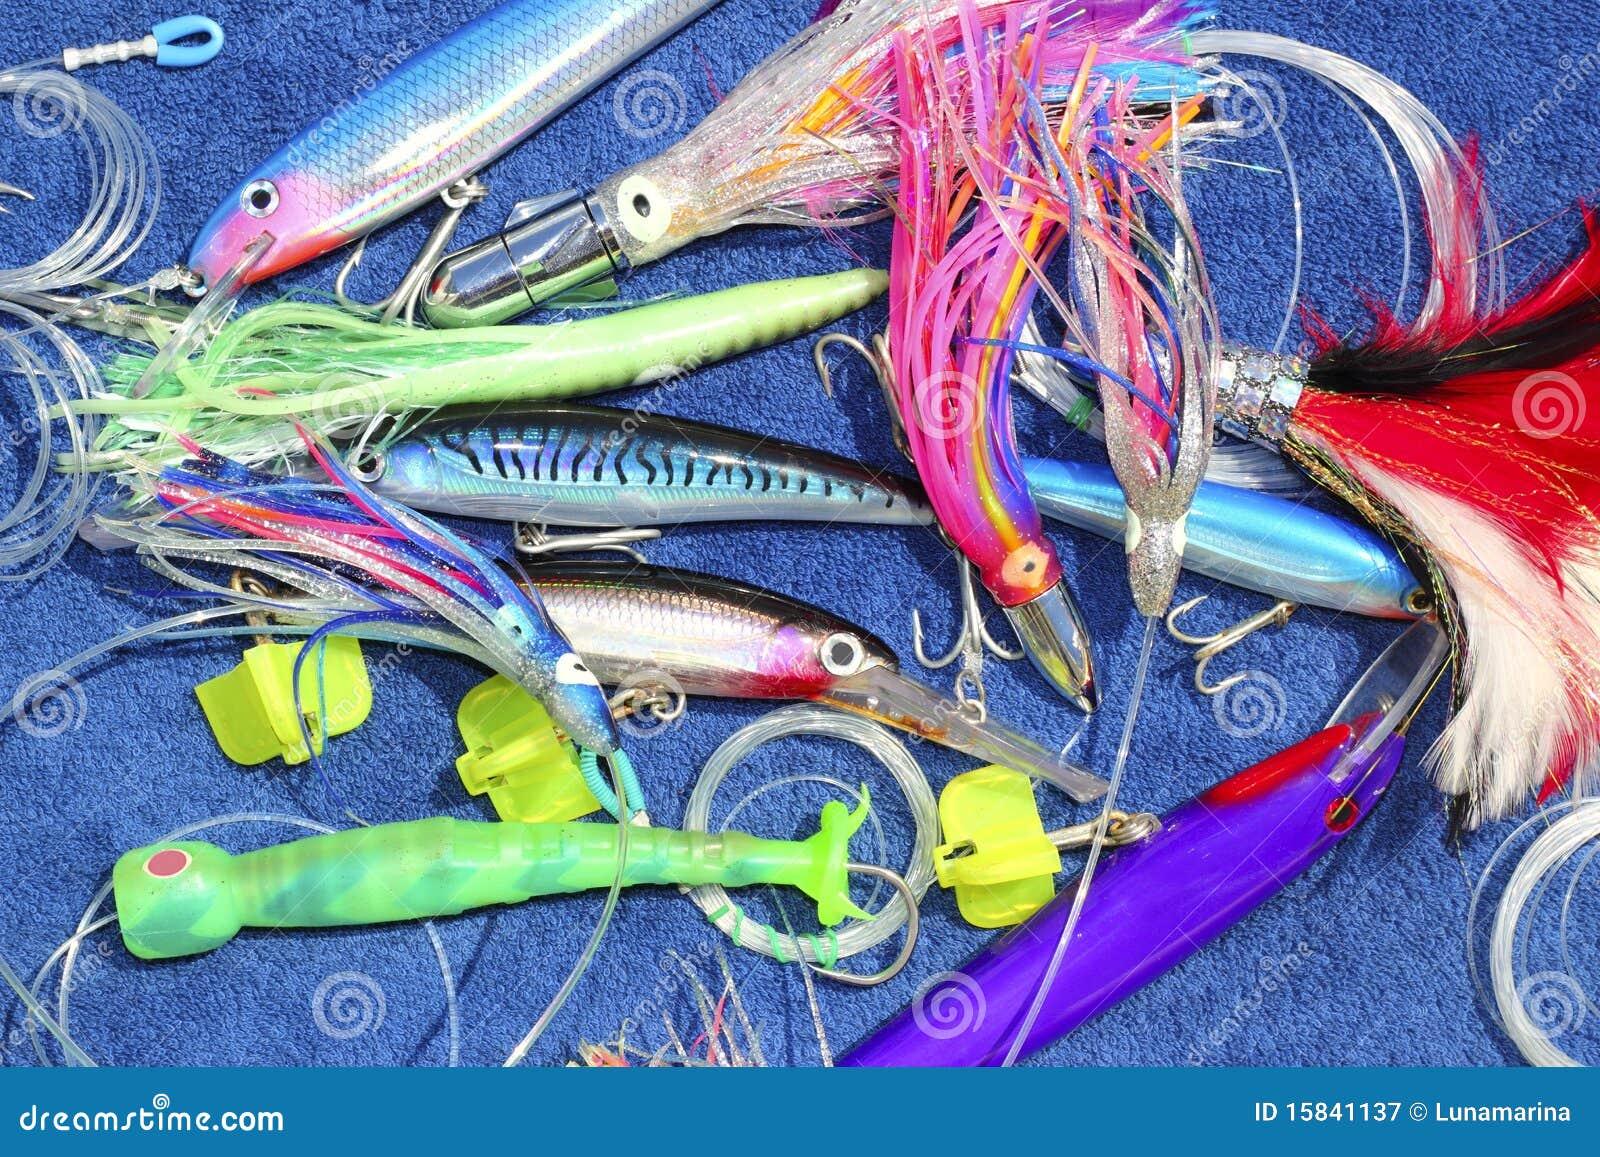 Big game fishing lures hook for tuna marlin stock image for Big fishing lures